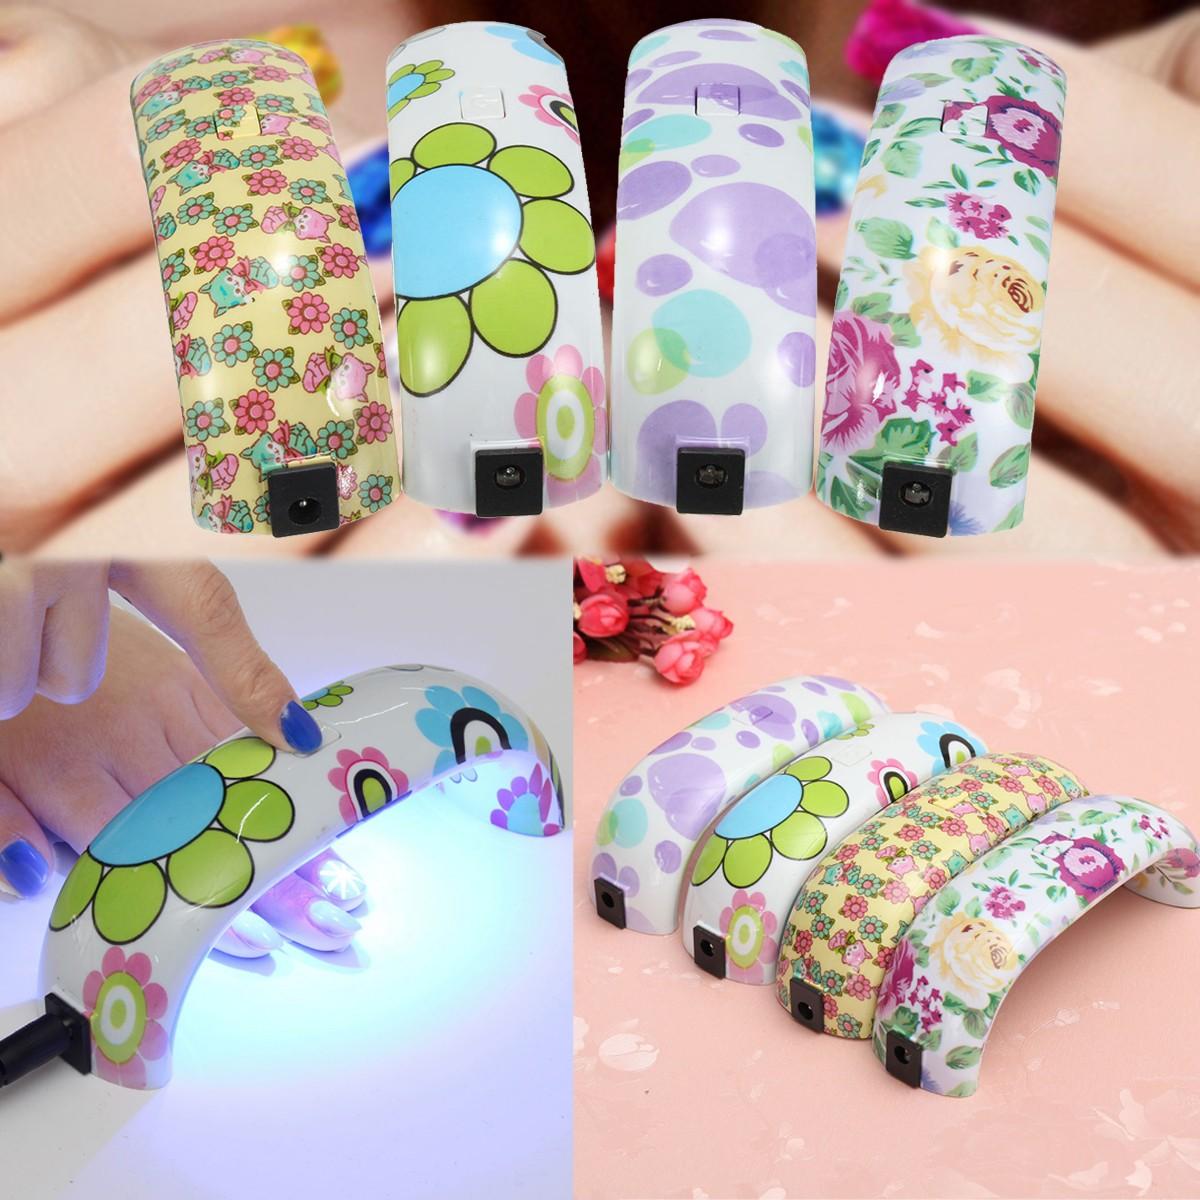 9W Mini LED Nail Dryer Curing Lamp Machine UV Gel Nail